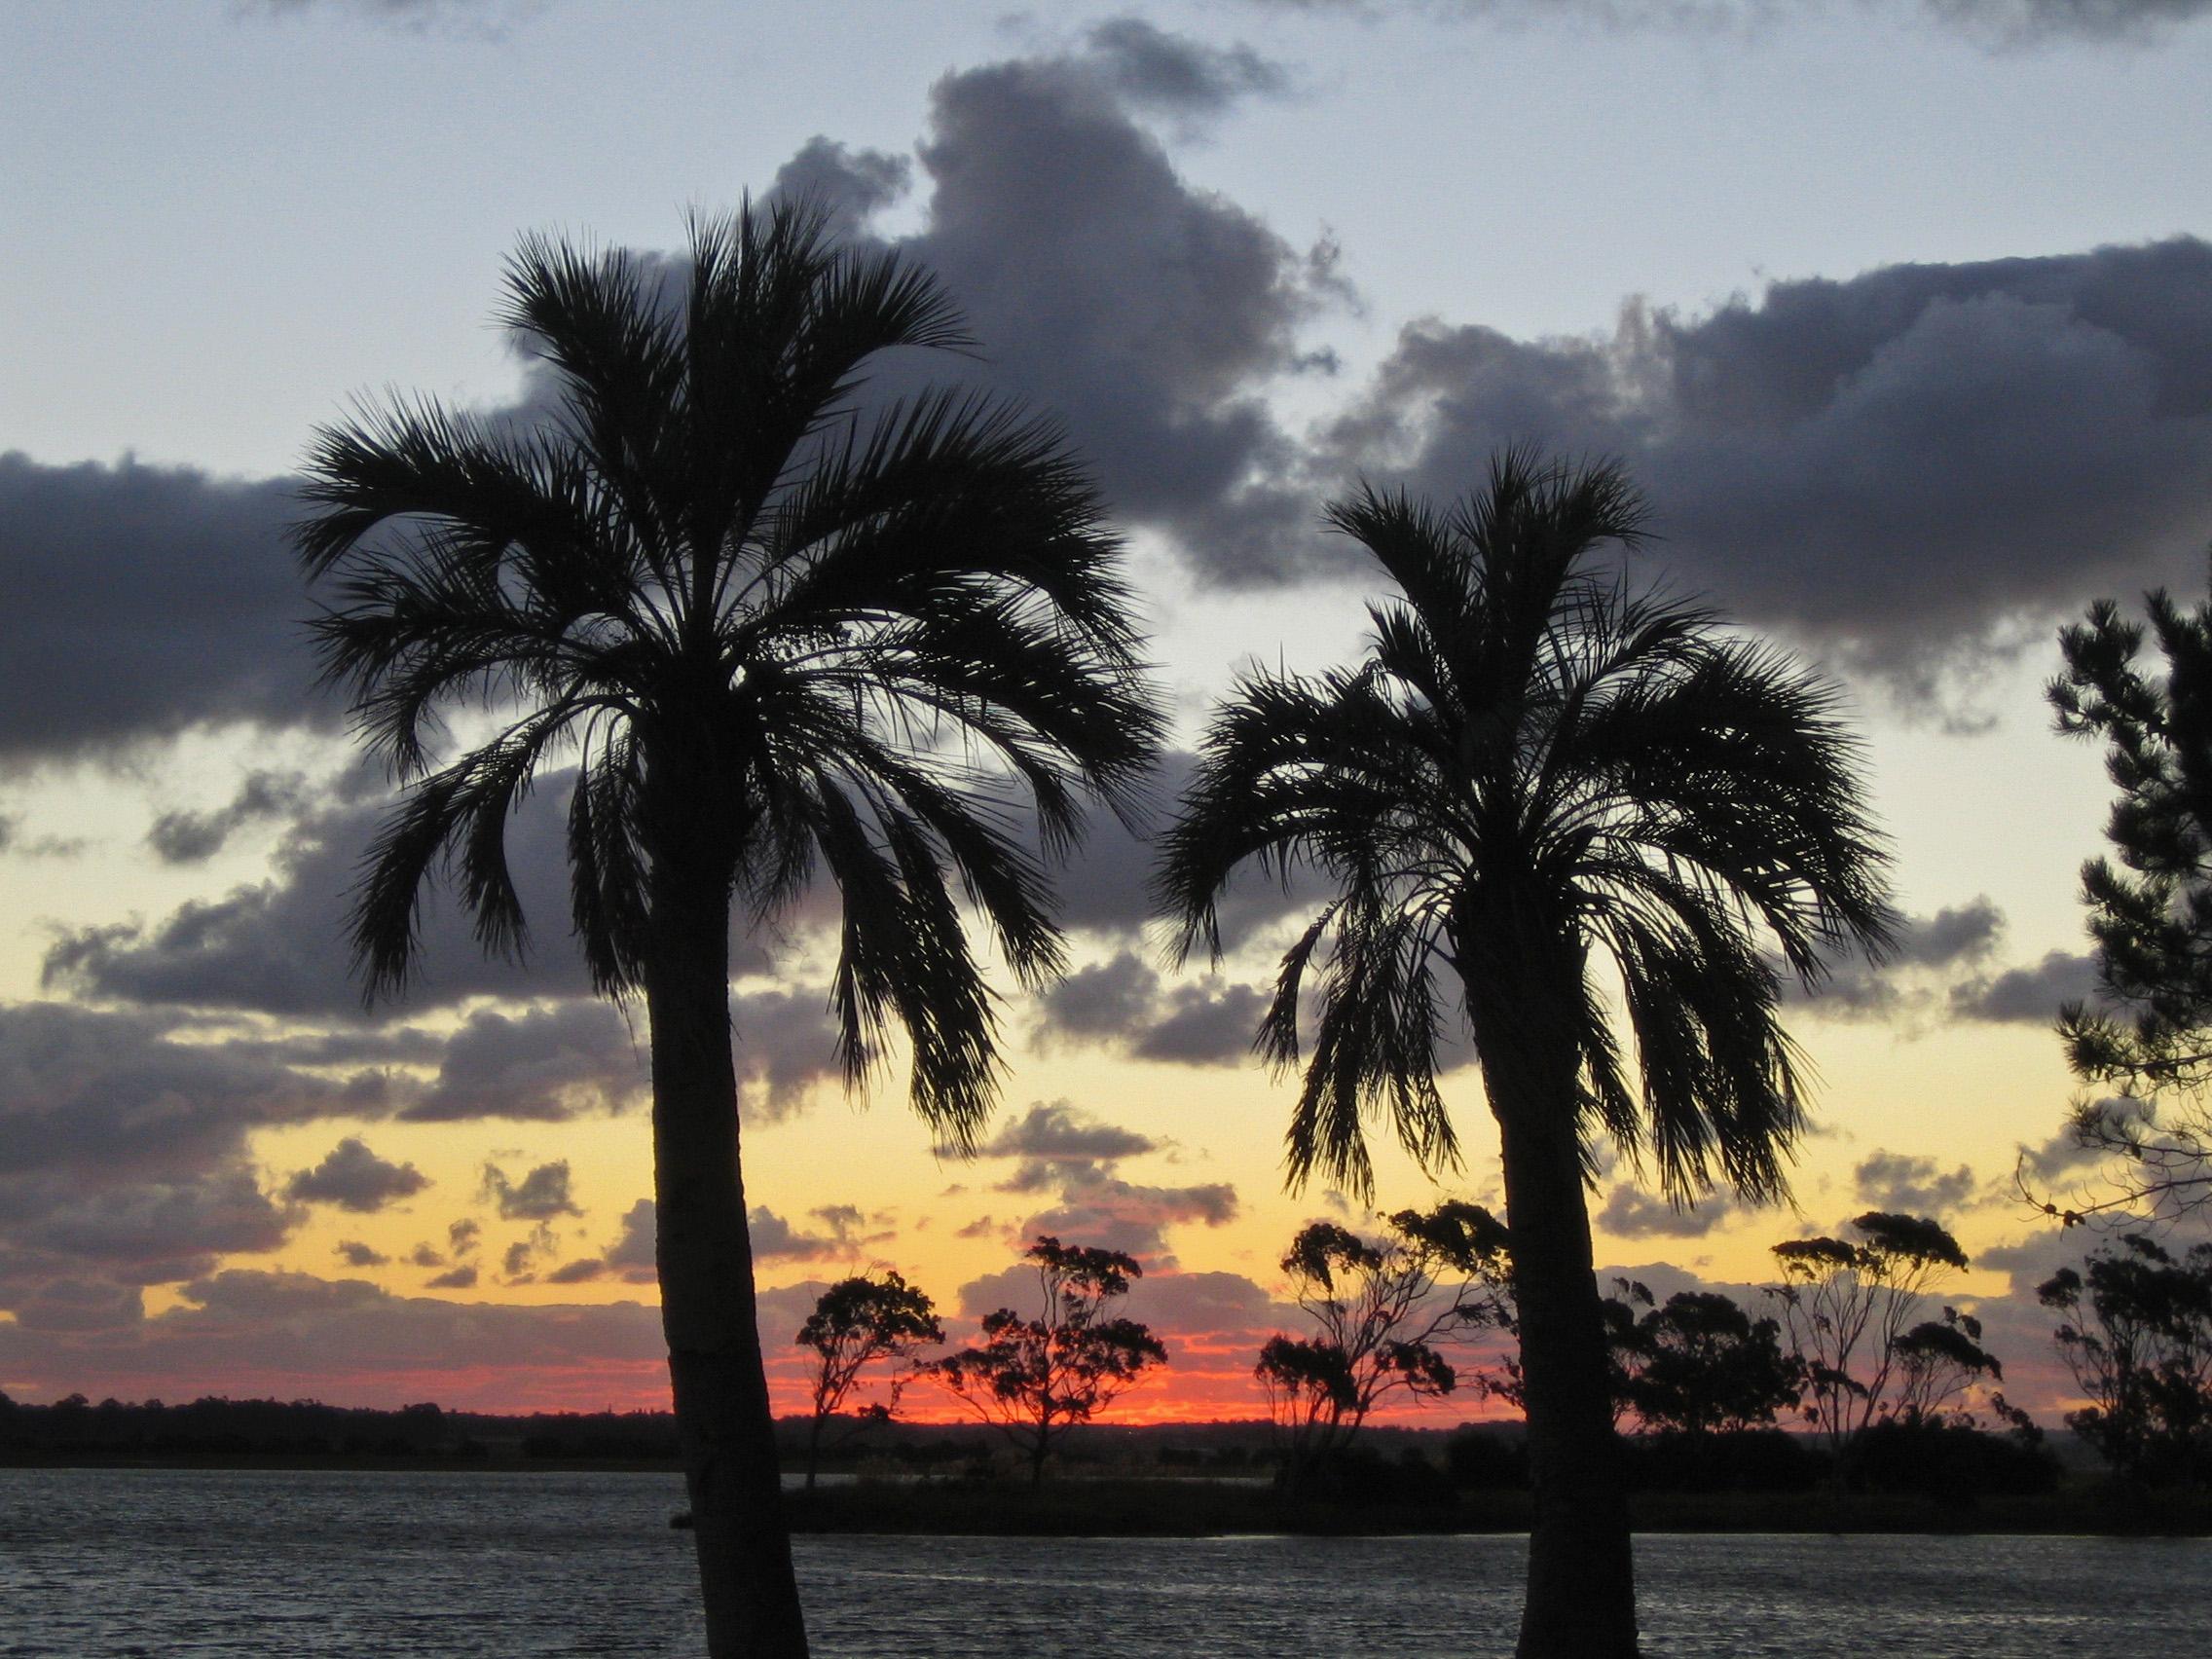 Image credit:  Palm Tree  by Historias de Cronopios, CC BY-NC-ND 2.0 via Flickr